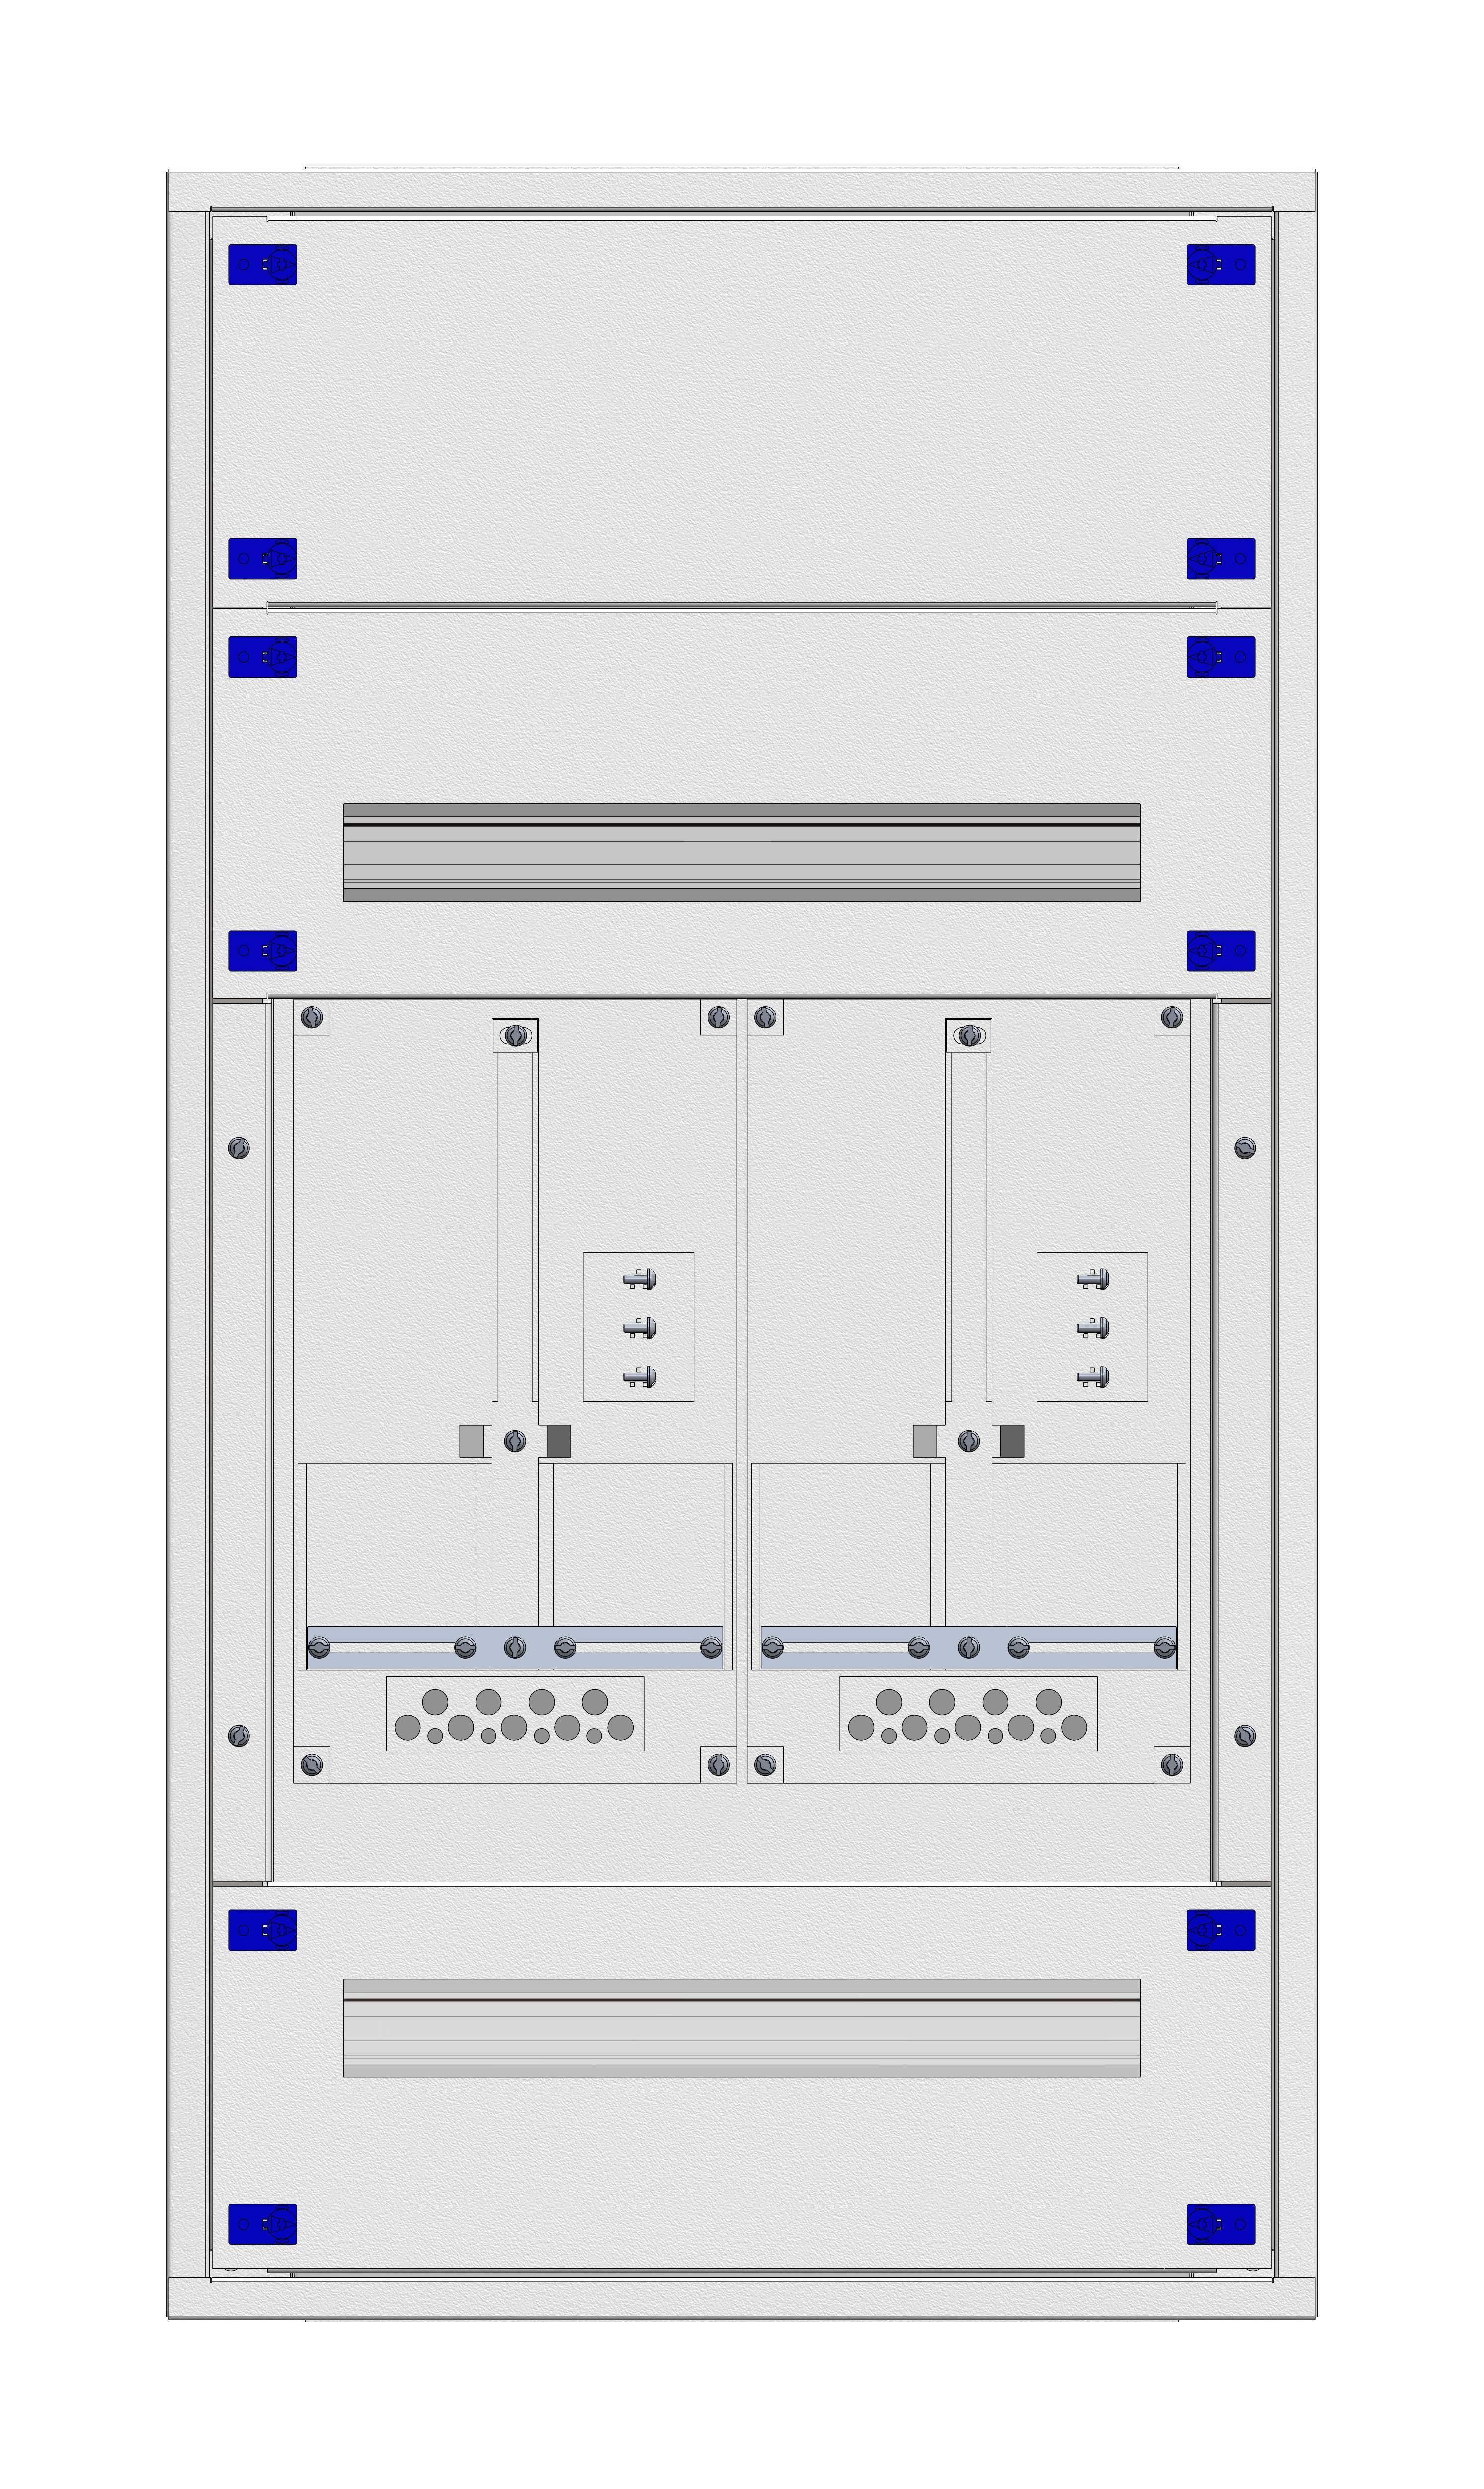 1 Stk Aufputz-Zählerverteiler 2A-21E/VBG 2ZP, H1055B590T250mm IL160221VS